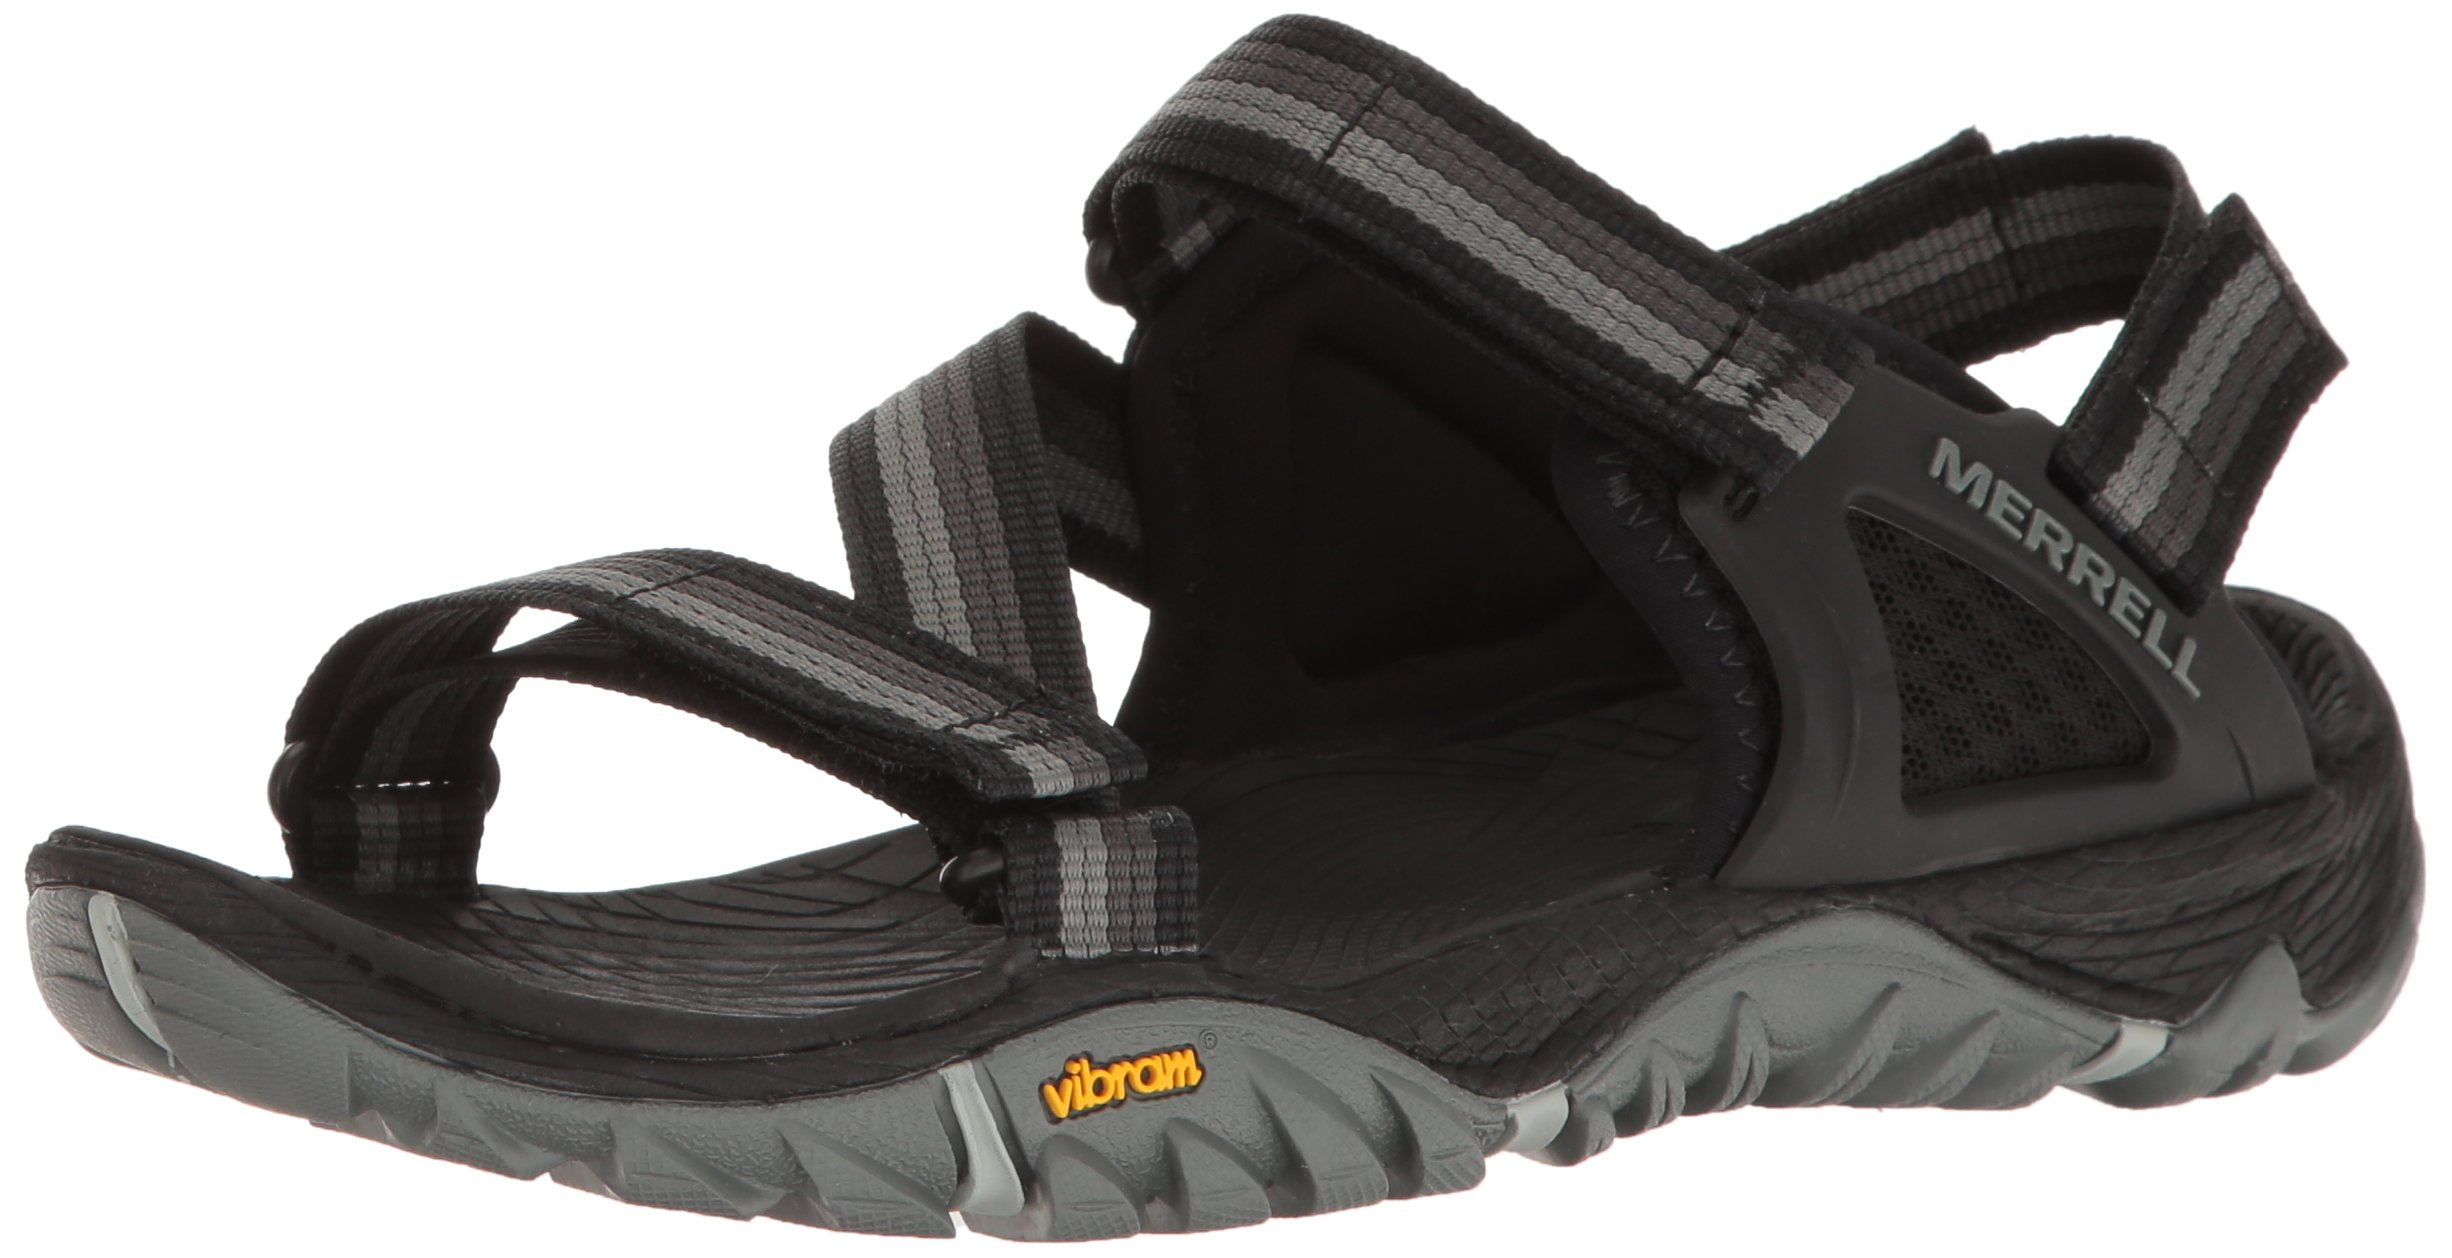 Merrell Women's All Out Blaze Web Sandal, Black, 9 M US by Merrell (Image #1)